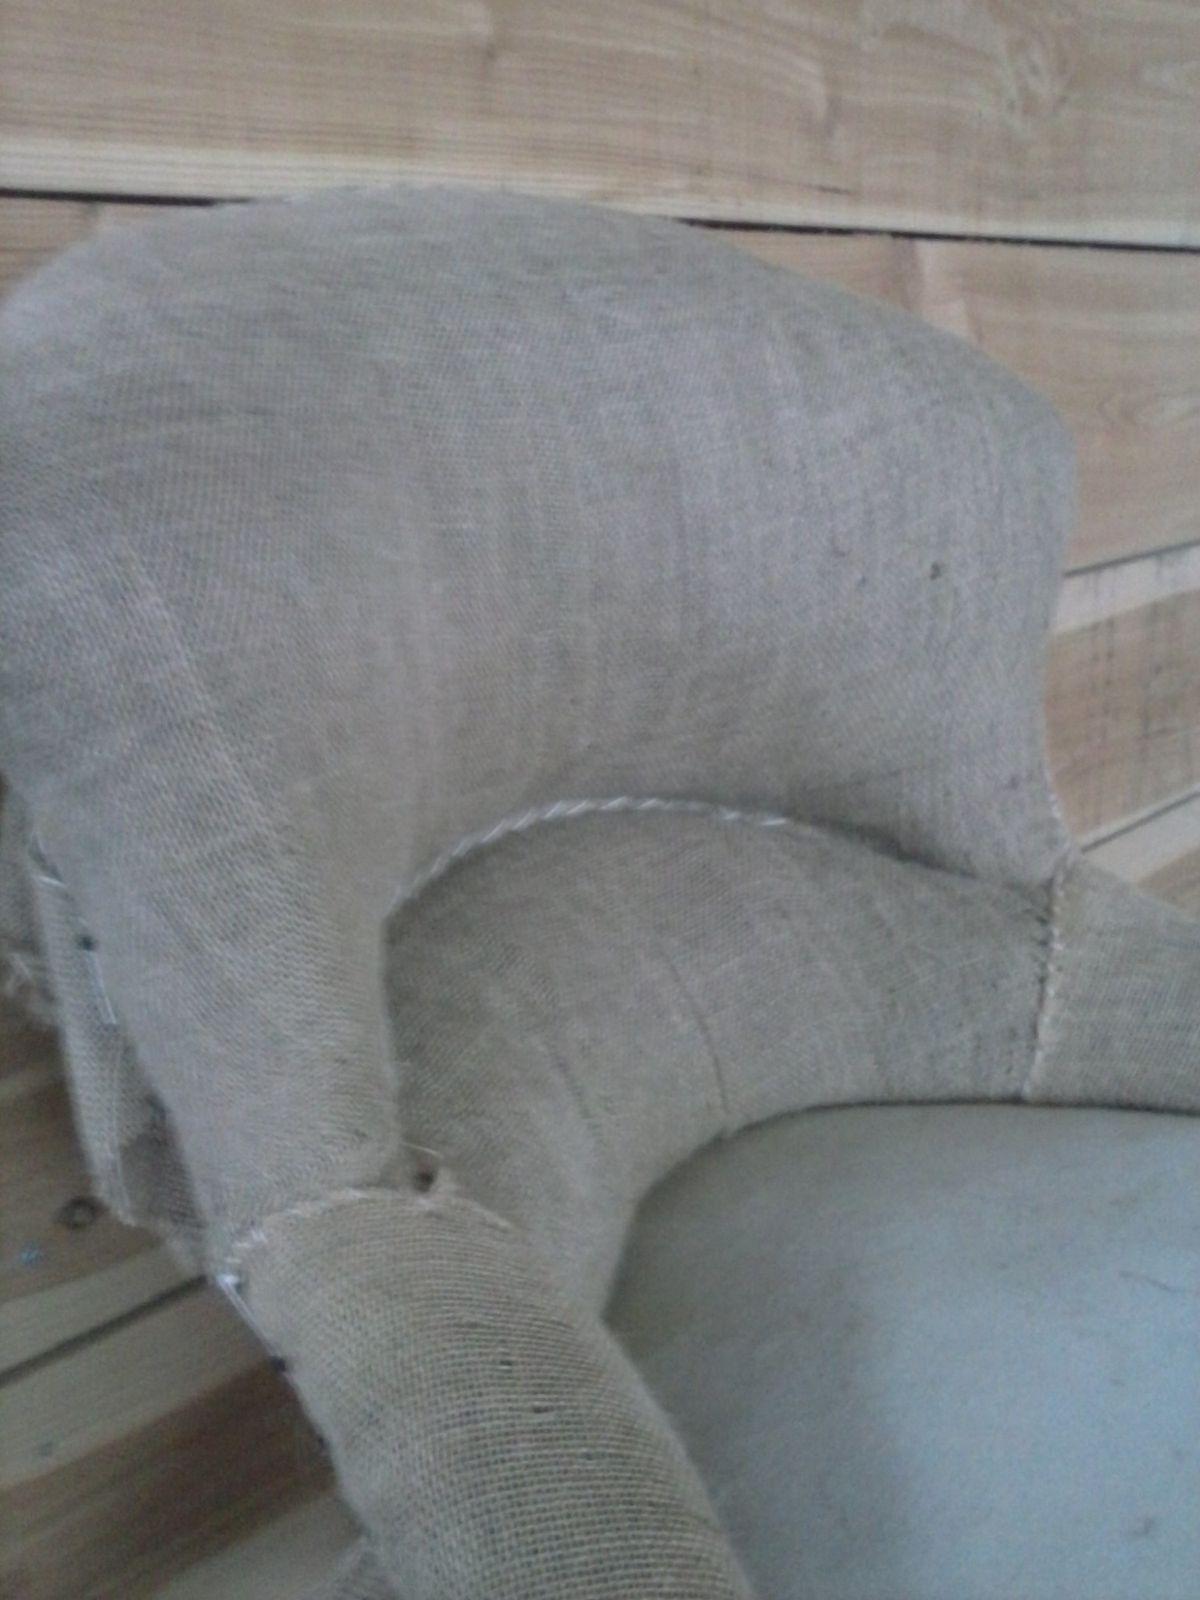 crapaud chauffeuse l 39 atelier de marine tapissiere couturiere. Black Bedroom Furniture Sets. Home Design Ideas